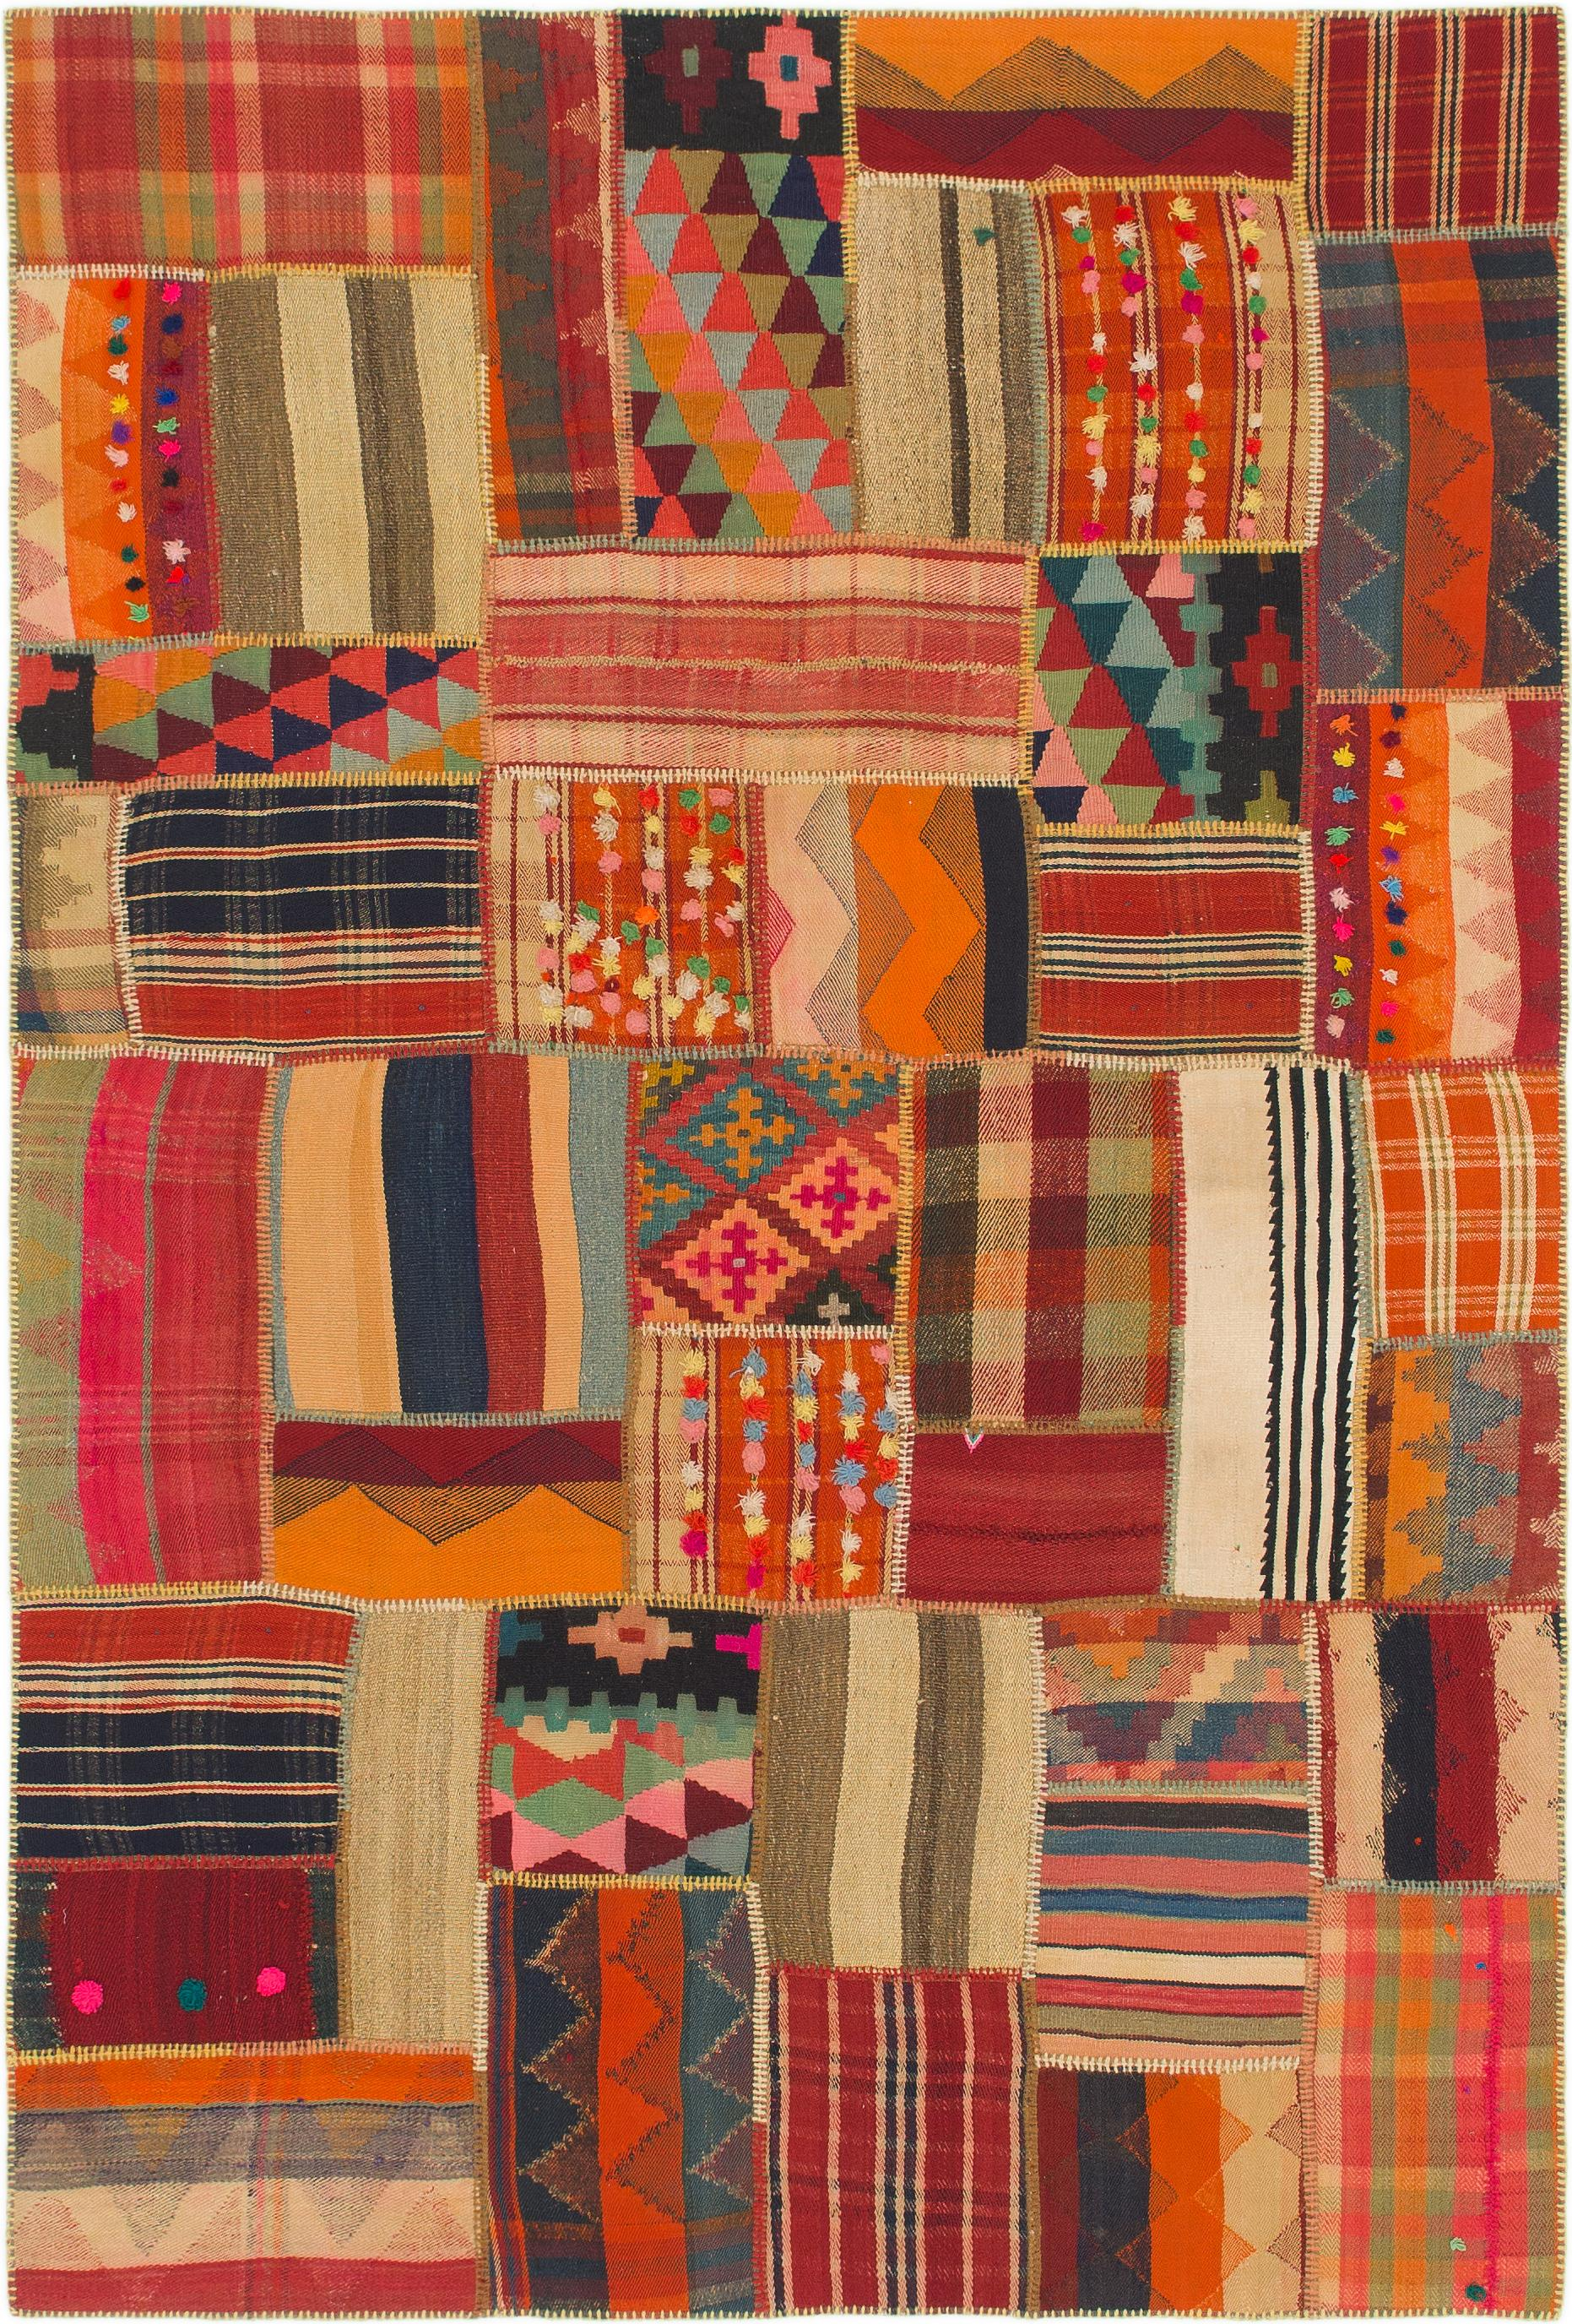 Multicolor 5 7 X 8 3 Kilim Patchwork Persian Rug Irugs Uk